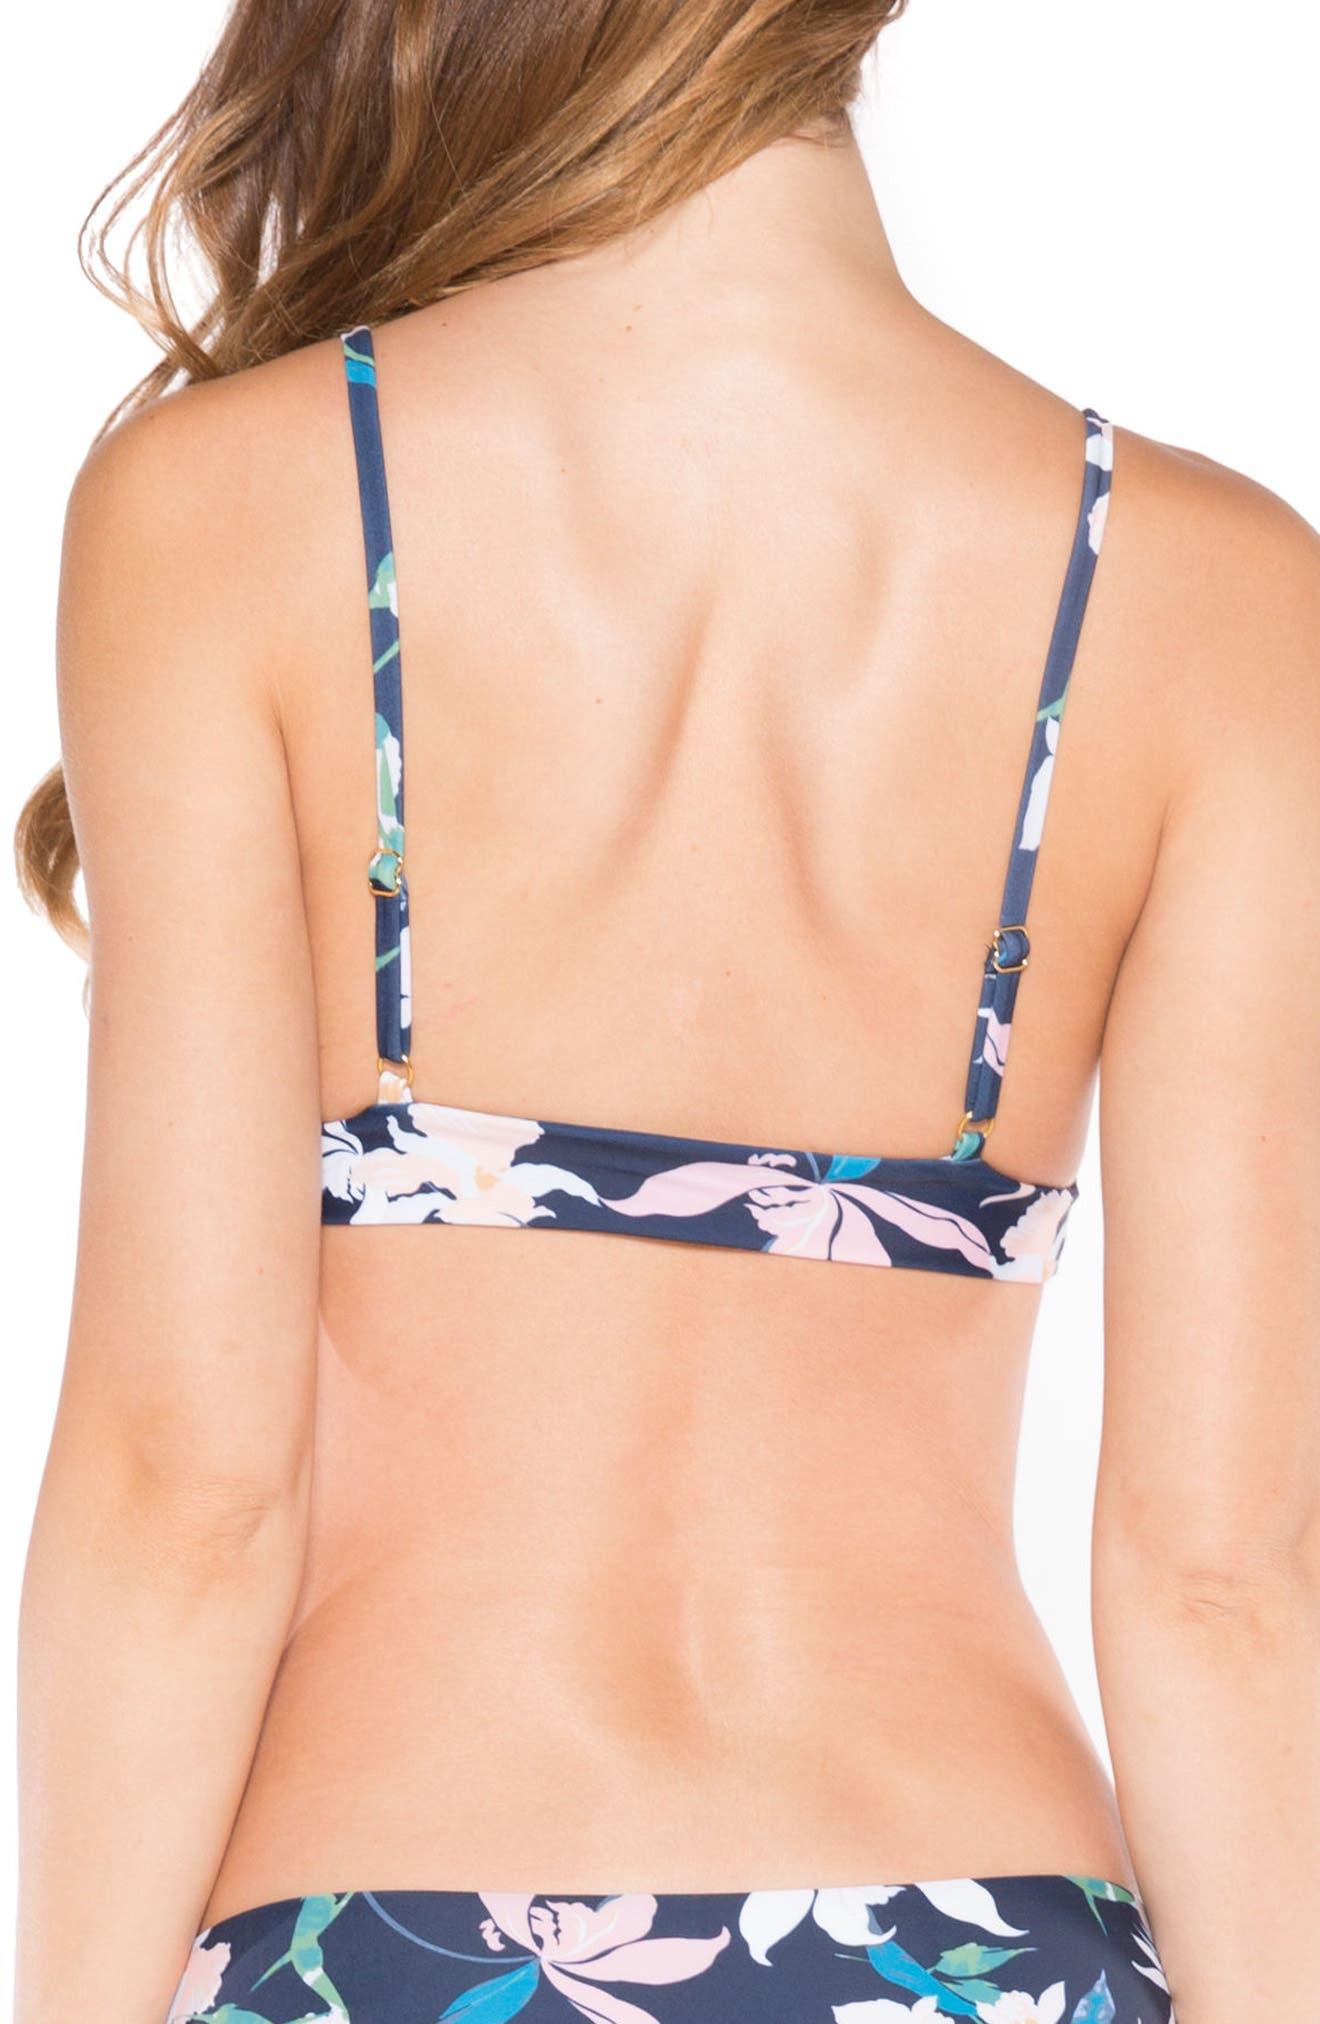 Arlo Bikini Top,                             Alternate thumbnail 2, color,                             461